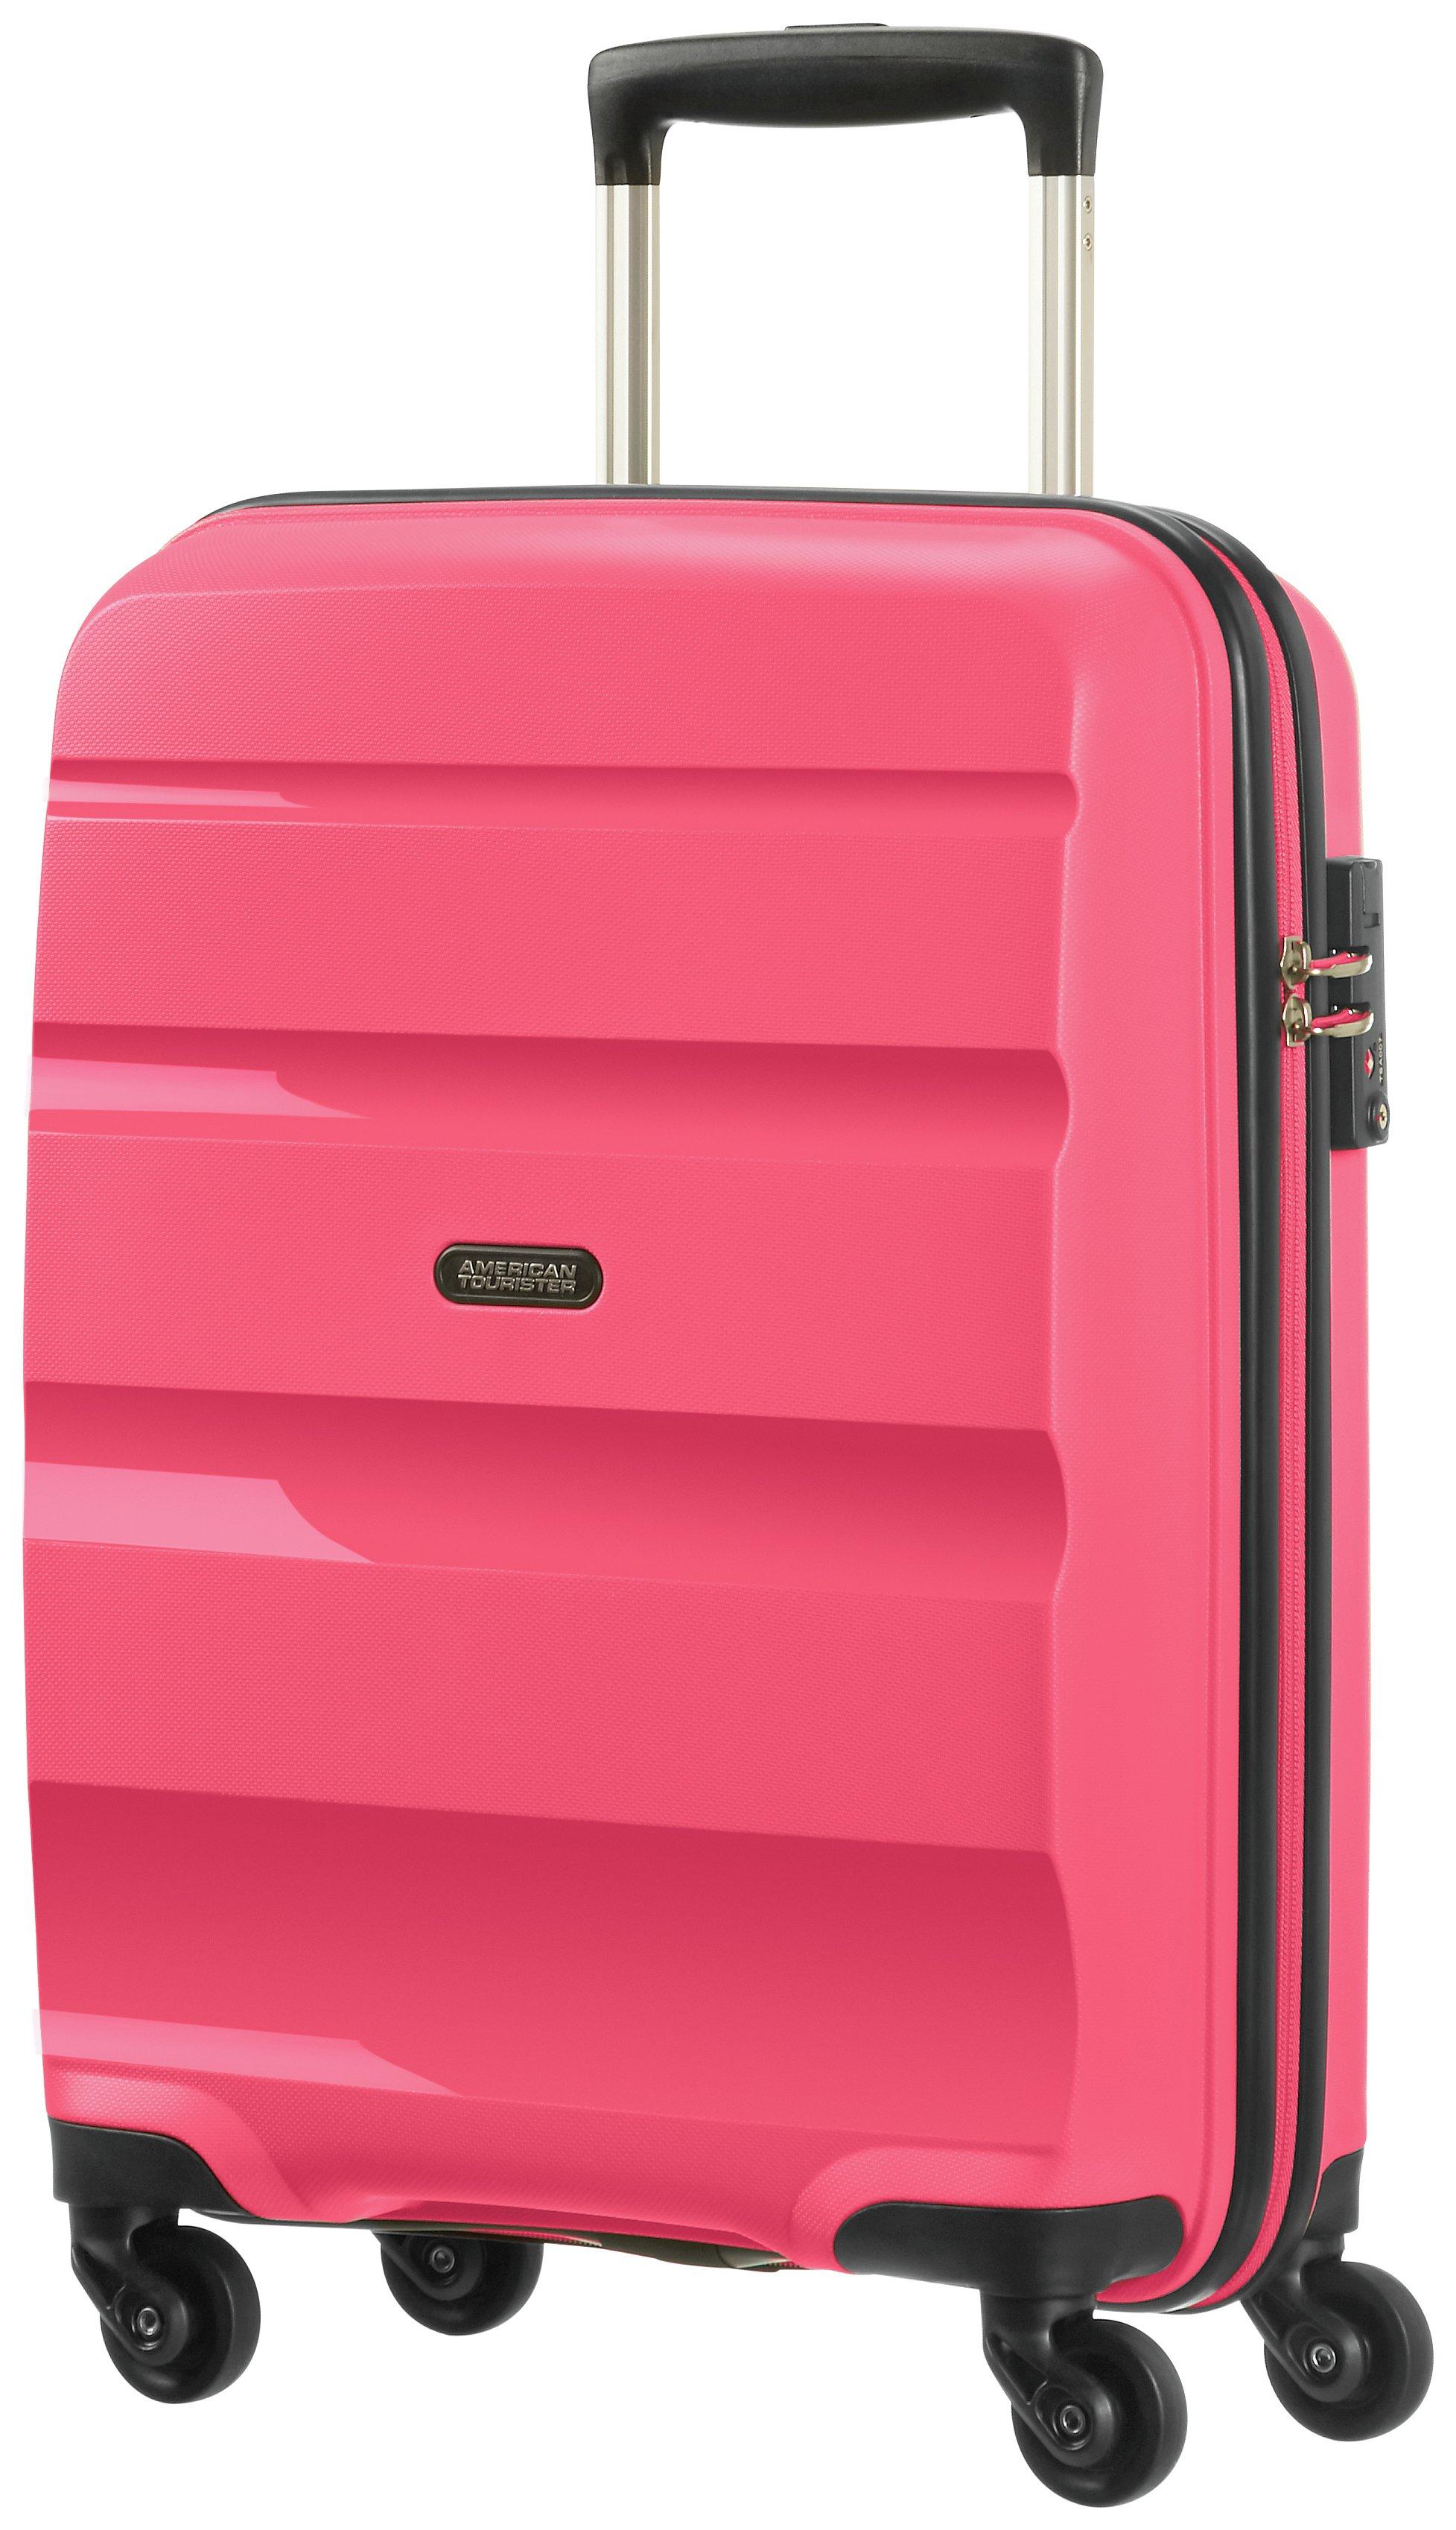 American Tourister Bon Air 4 Wheel Spinner - Fresh Pink